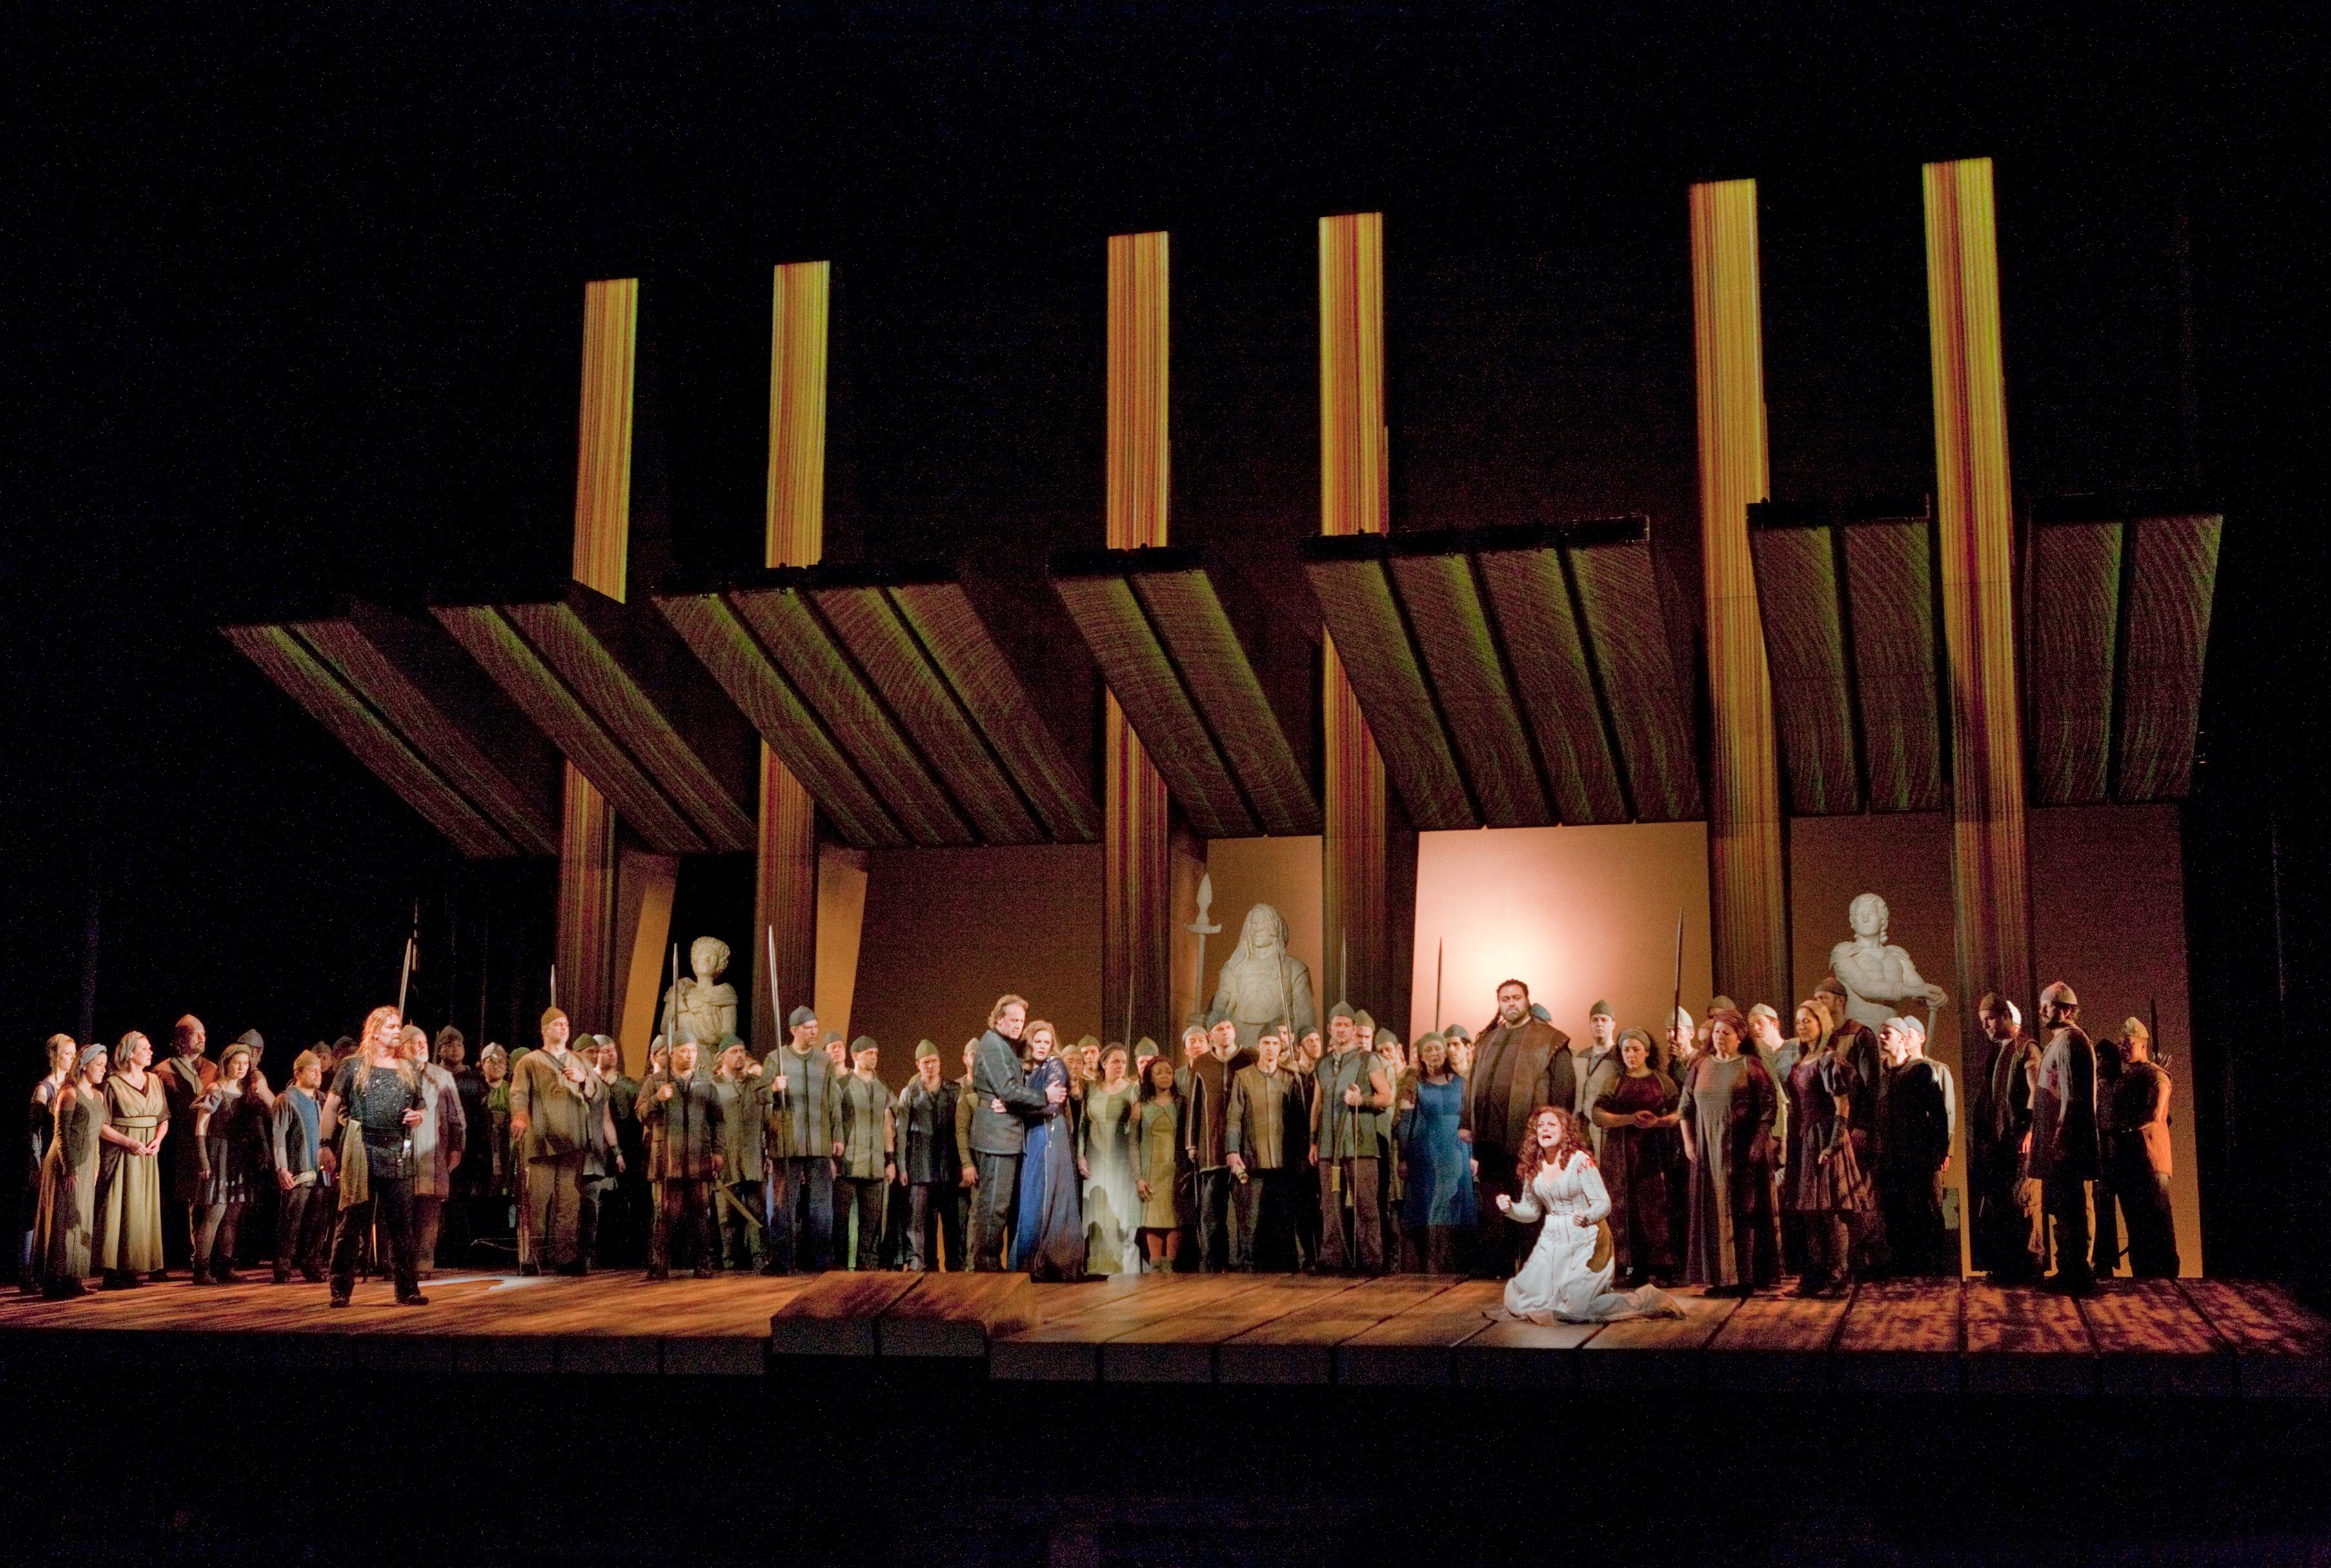 scene-from-act-ii-of-gotterdammerung-by-wagner-photo-ken-howard-metropolitan-opera-c-20121